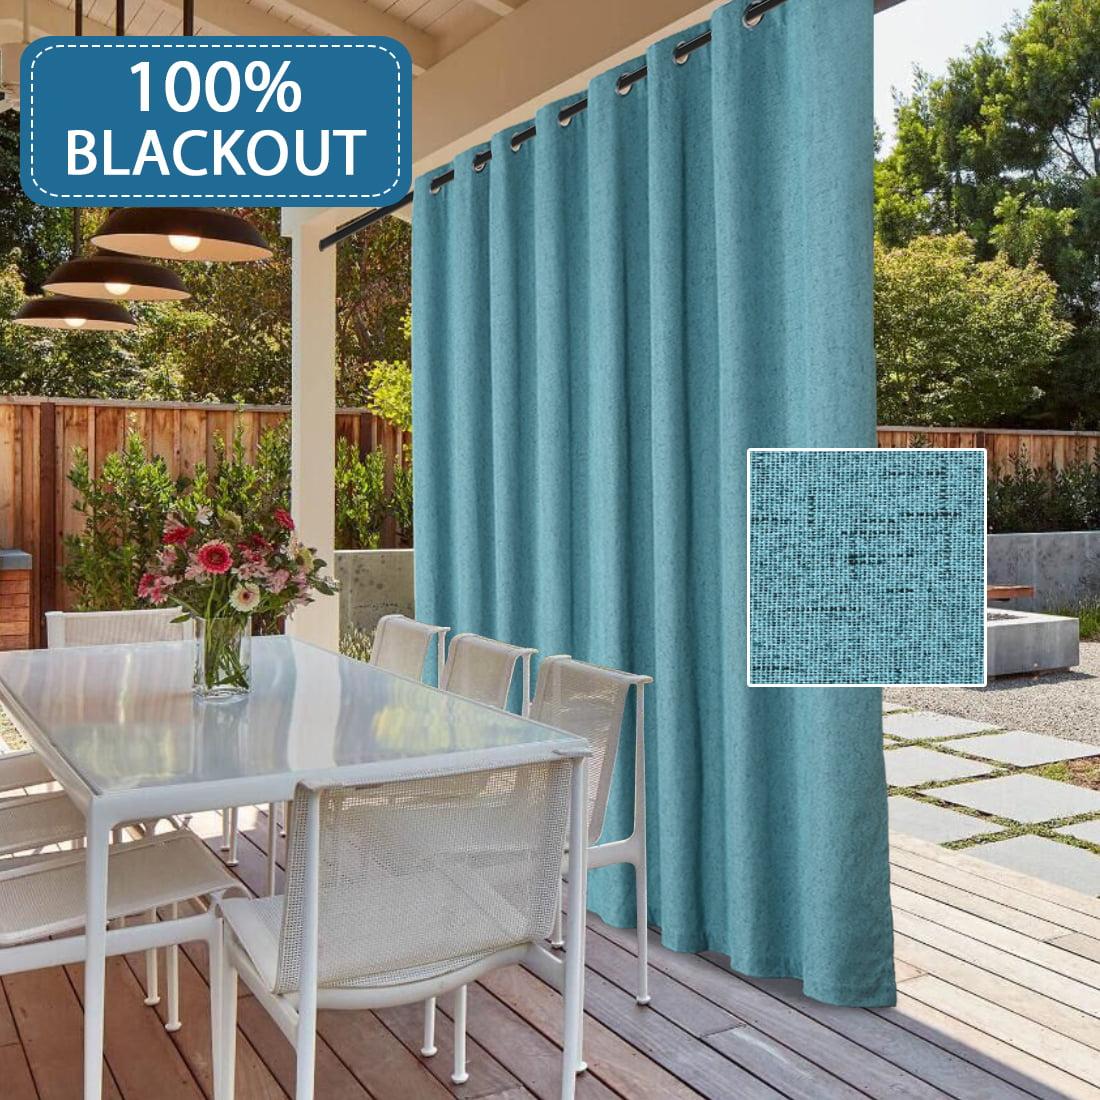 Waterproof Outdoor Rich Linen Patio Curtain 100 Blackout